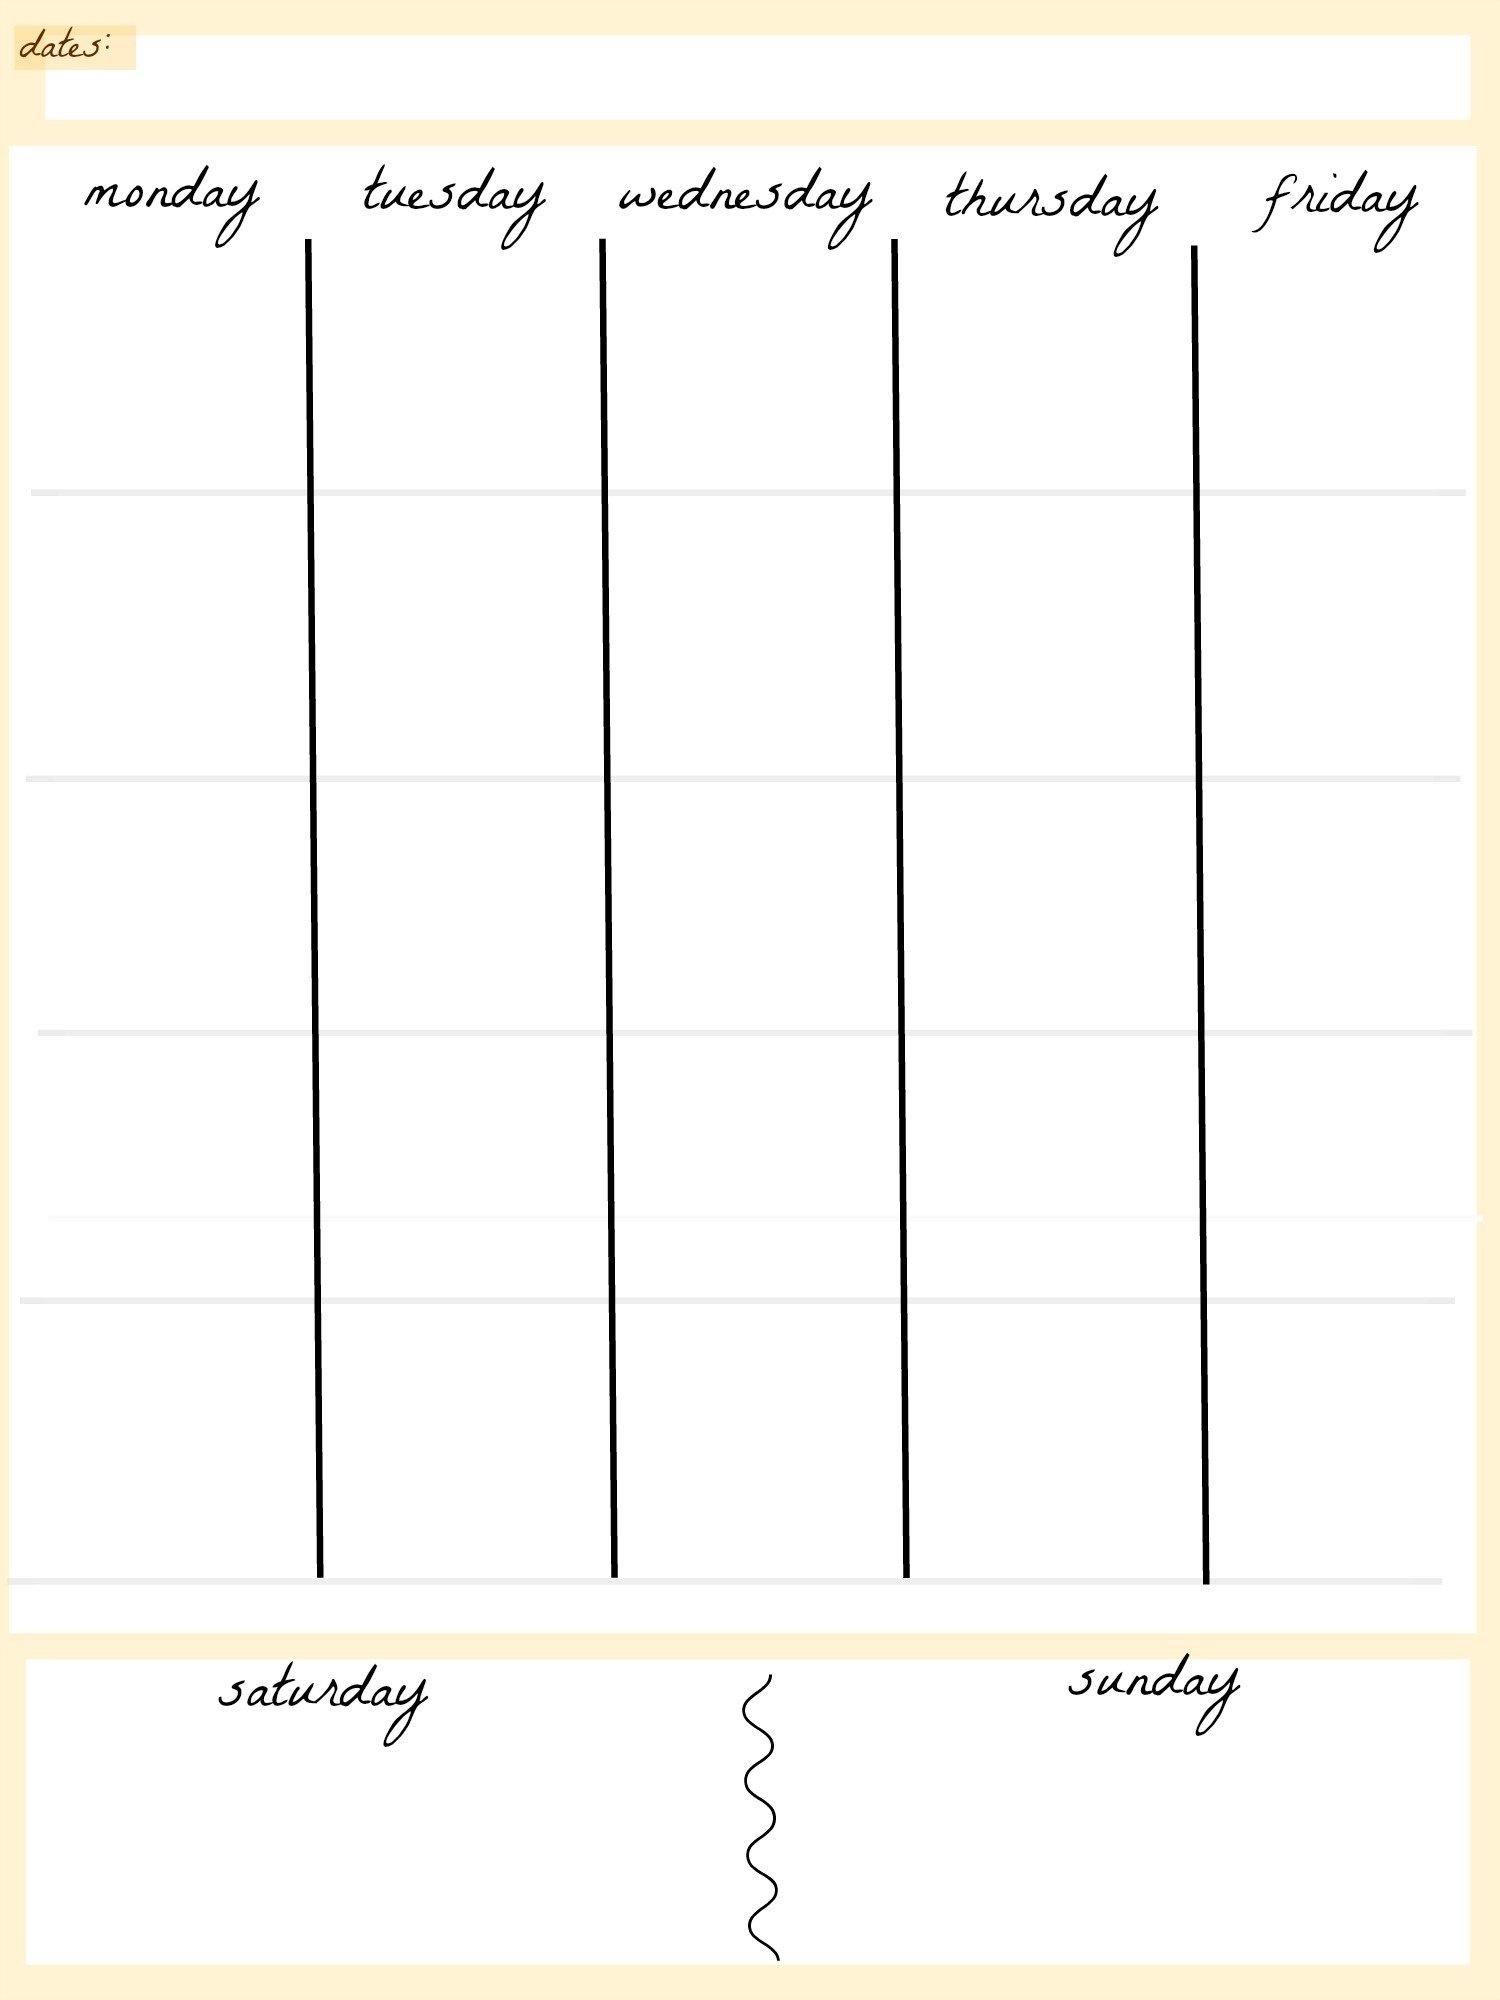 April 2019 – Page 2 – Template Calendar Design Free 4 Year Calendar Printable